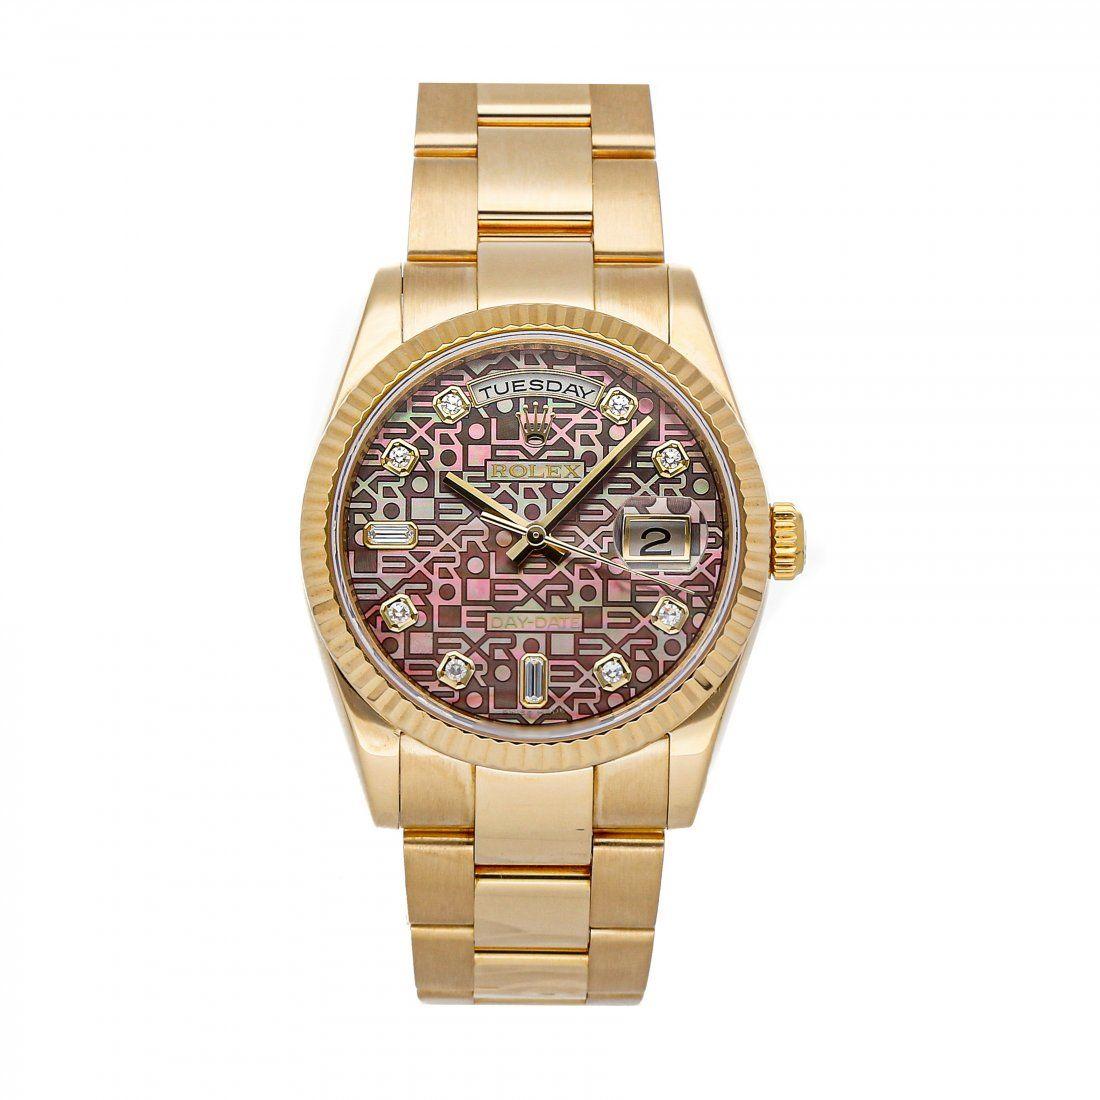 Rolex Day-Date 36 Yellow Gold Diamond Watch 118238